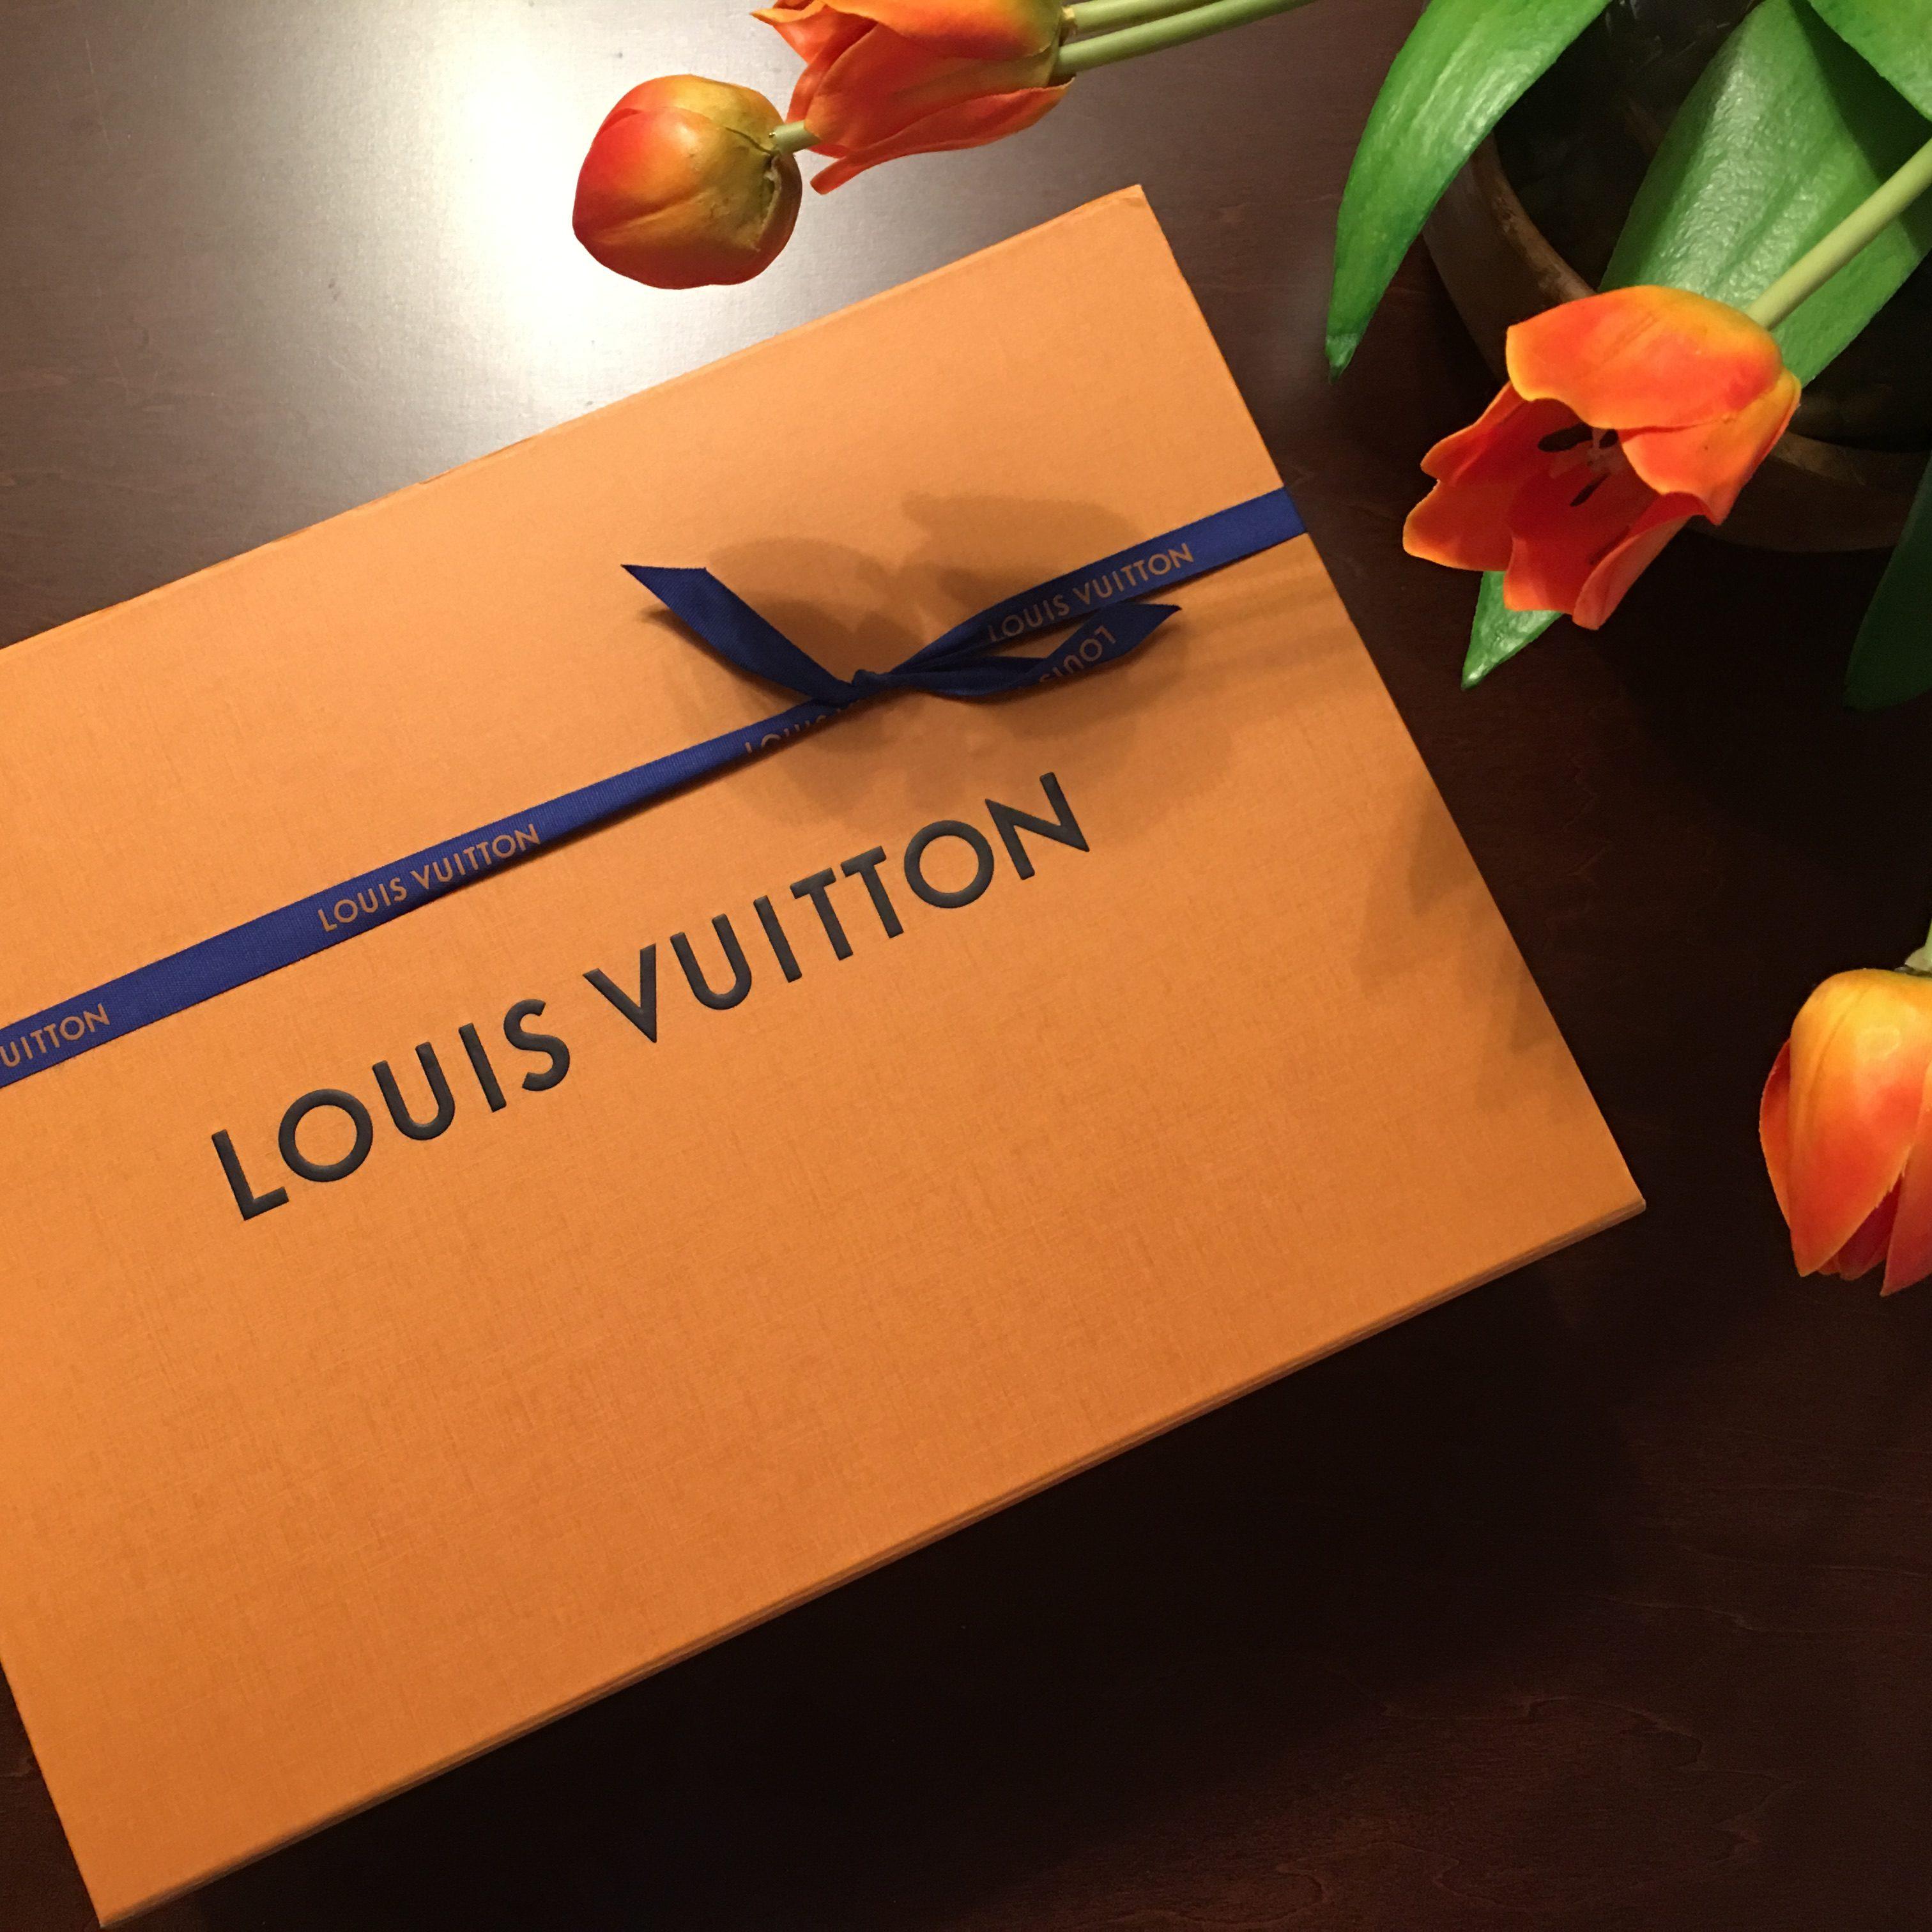 Orange Louis Vuitton box with blue ribbon